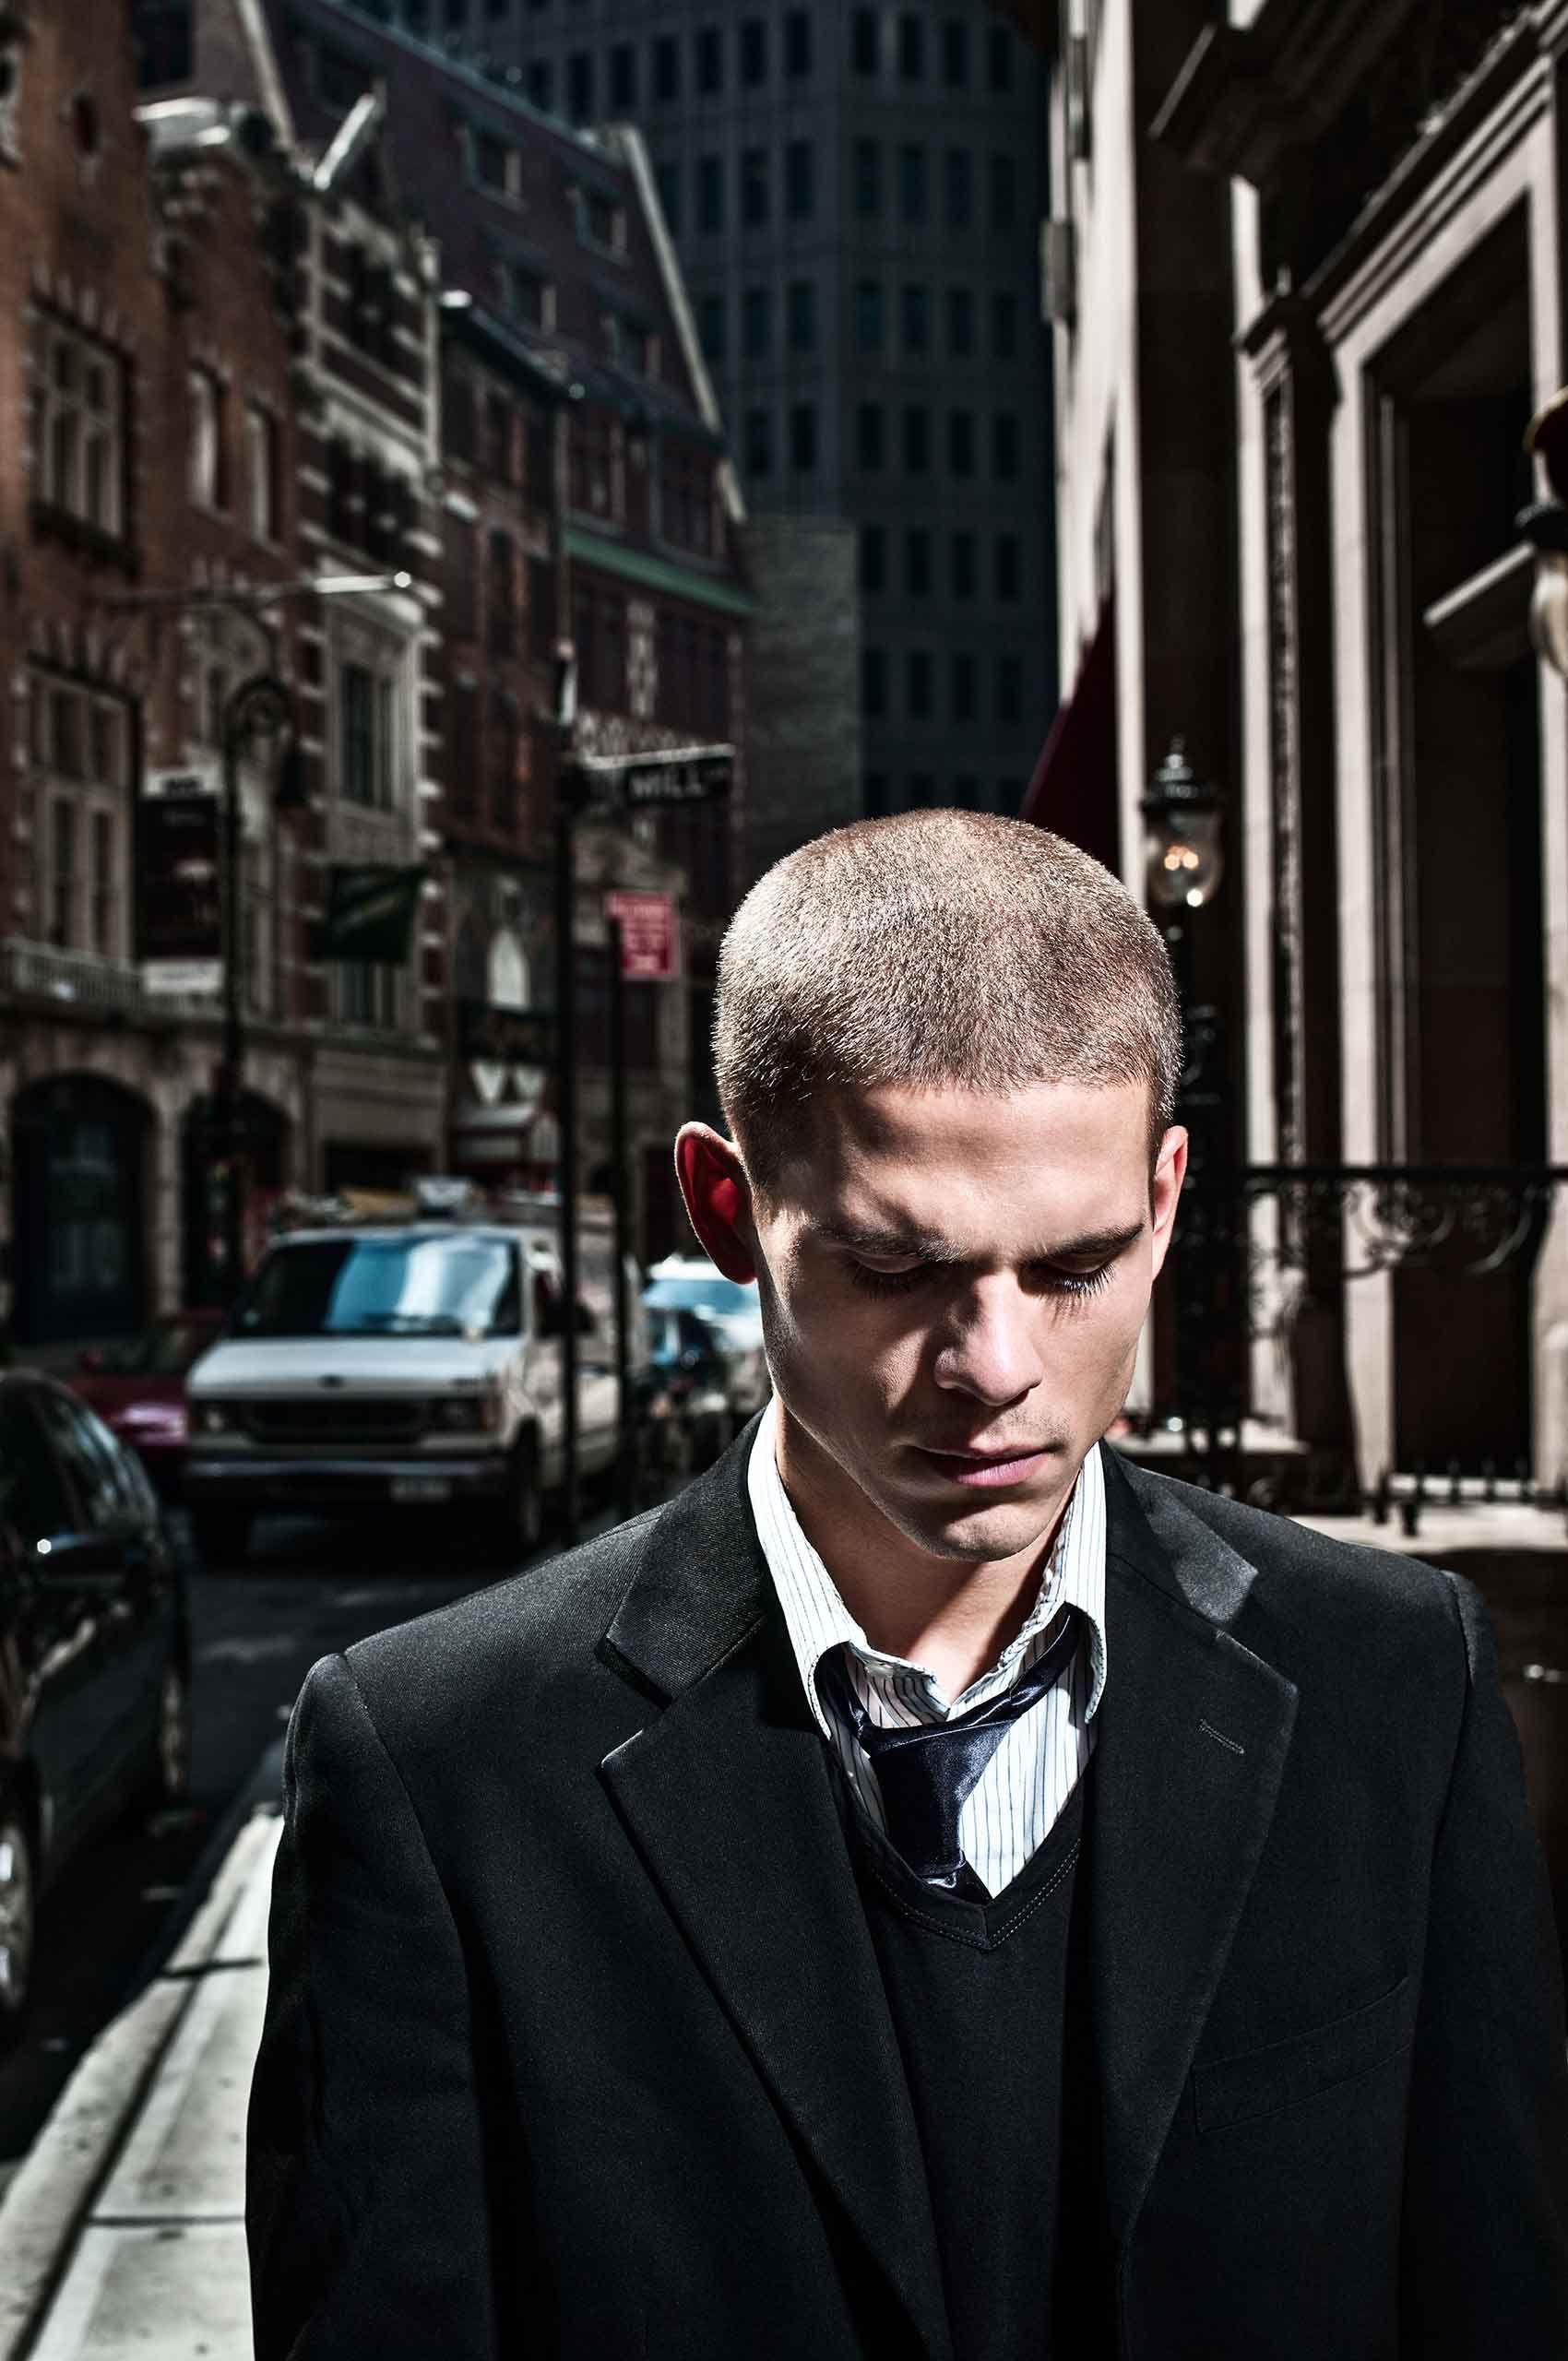 young-man-on-street-filmnoir-by-HenrikOlundPhotography.jpg